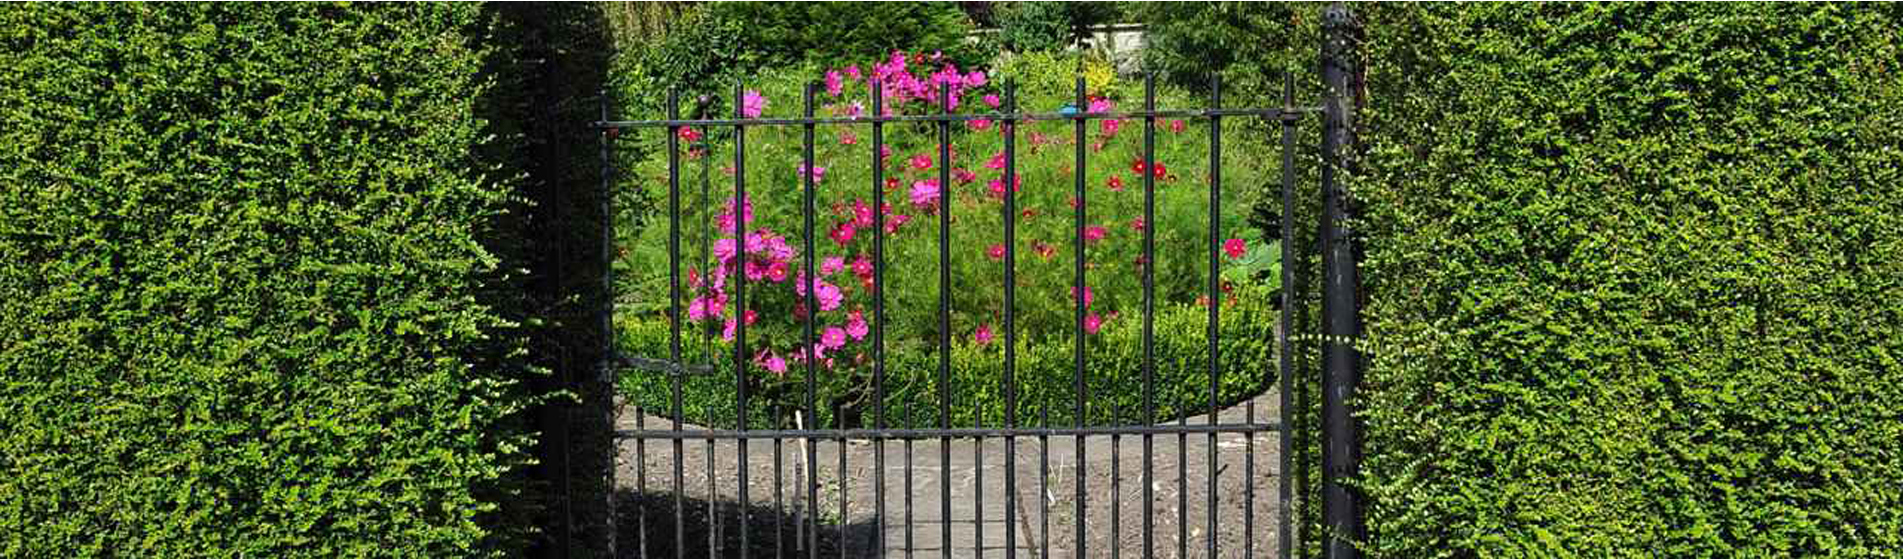 pose portail battant alu 13 Bouches-du-Rhône